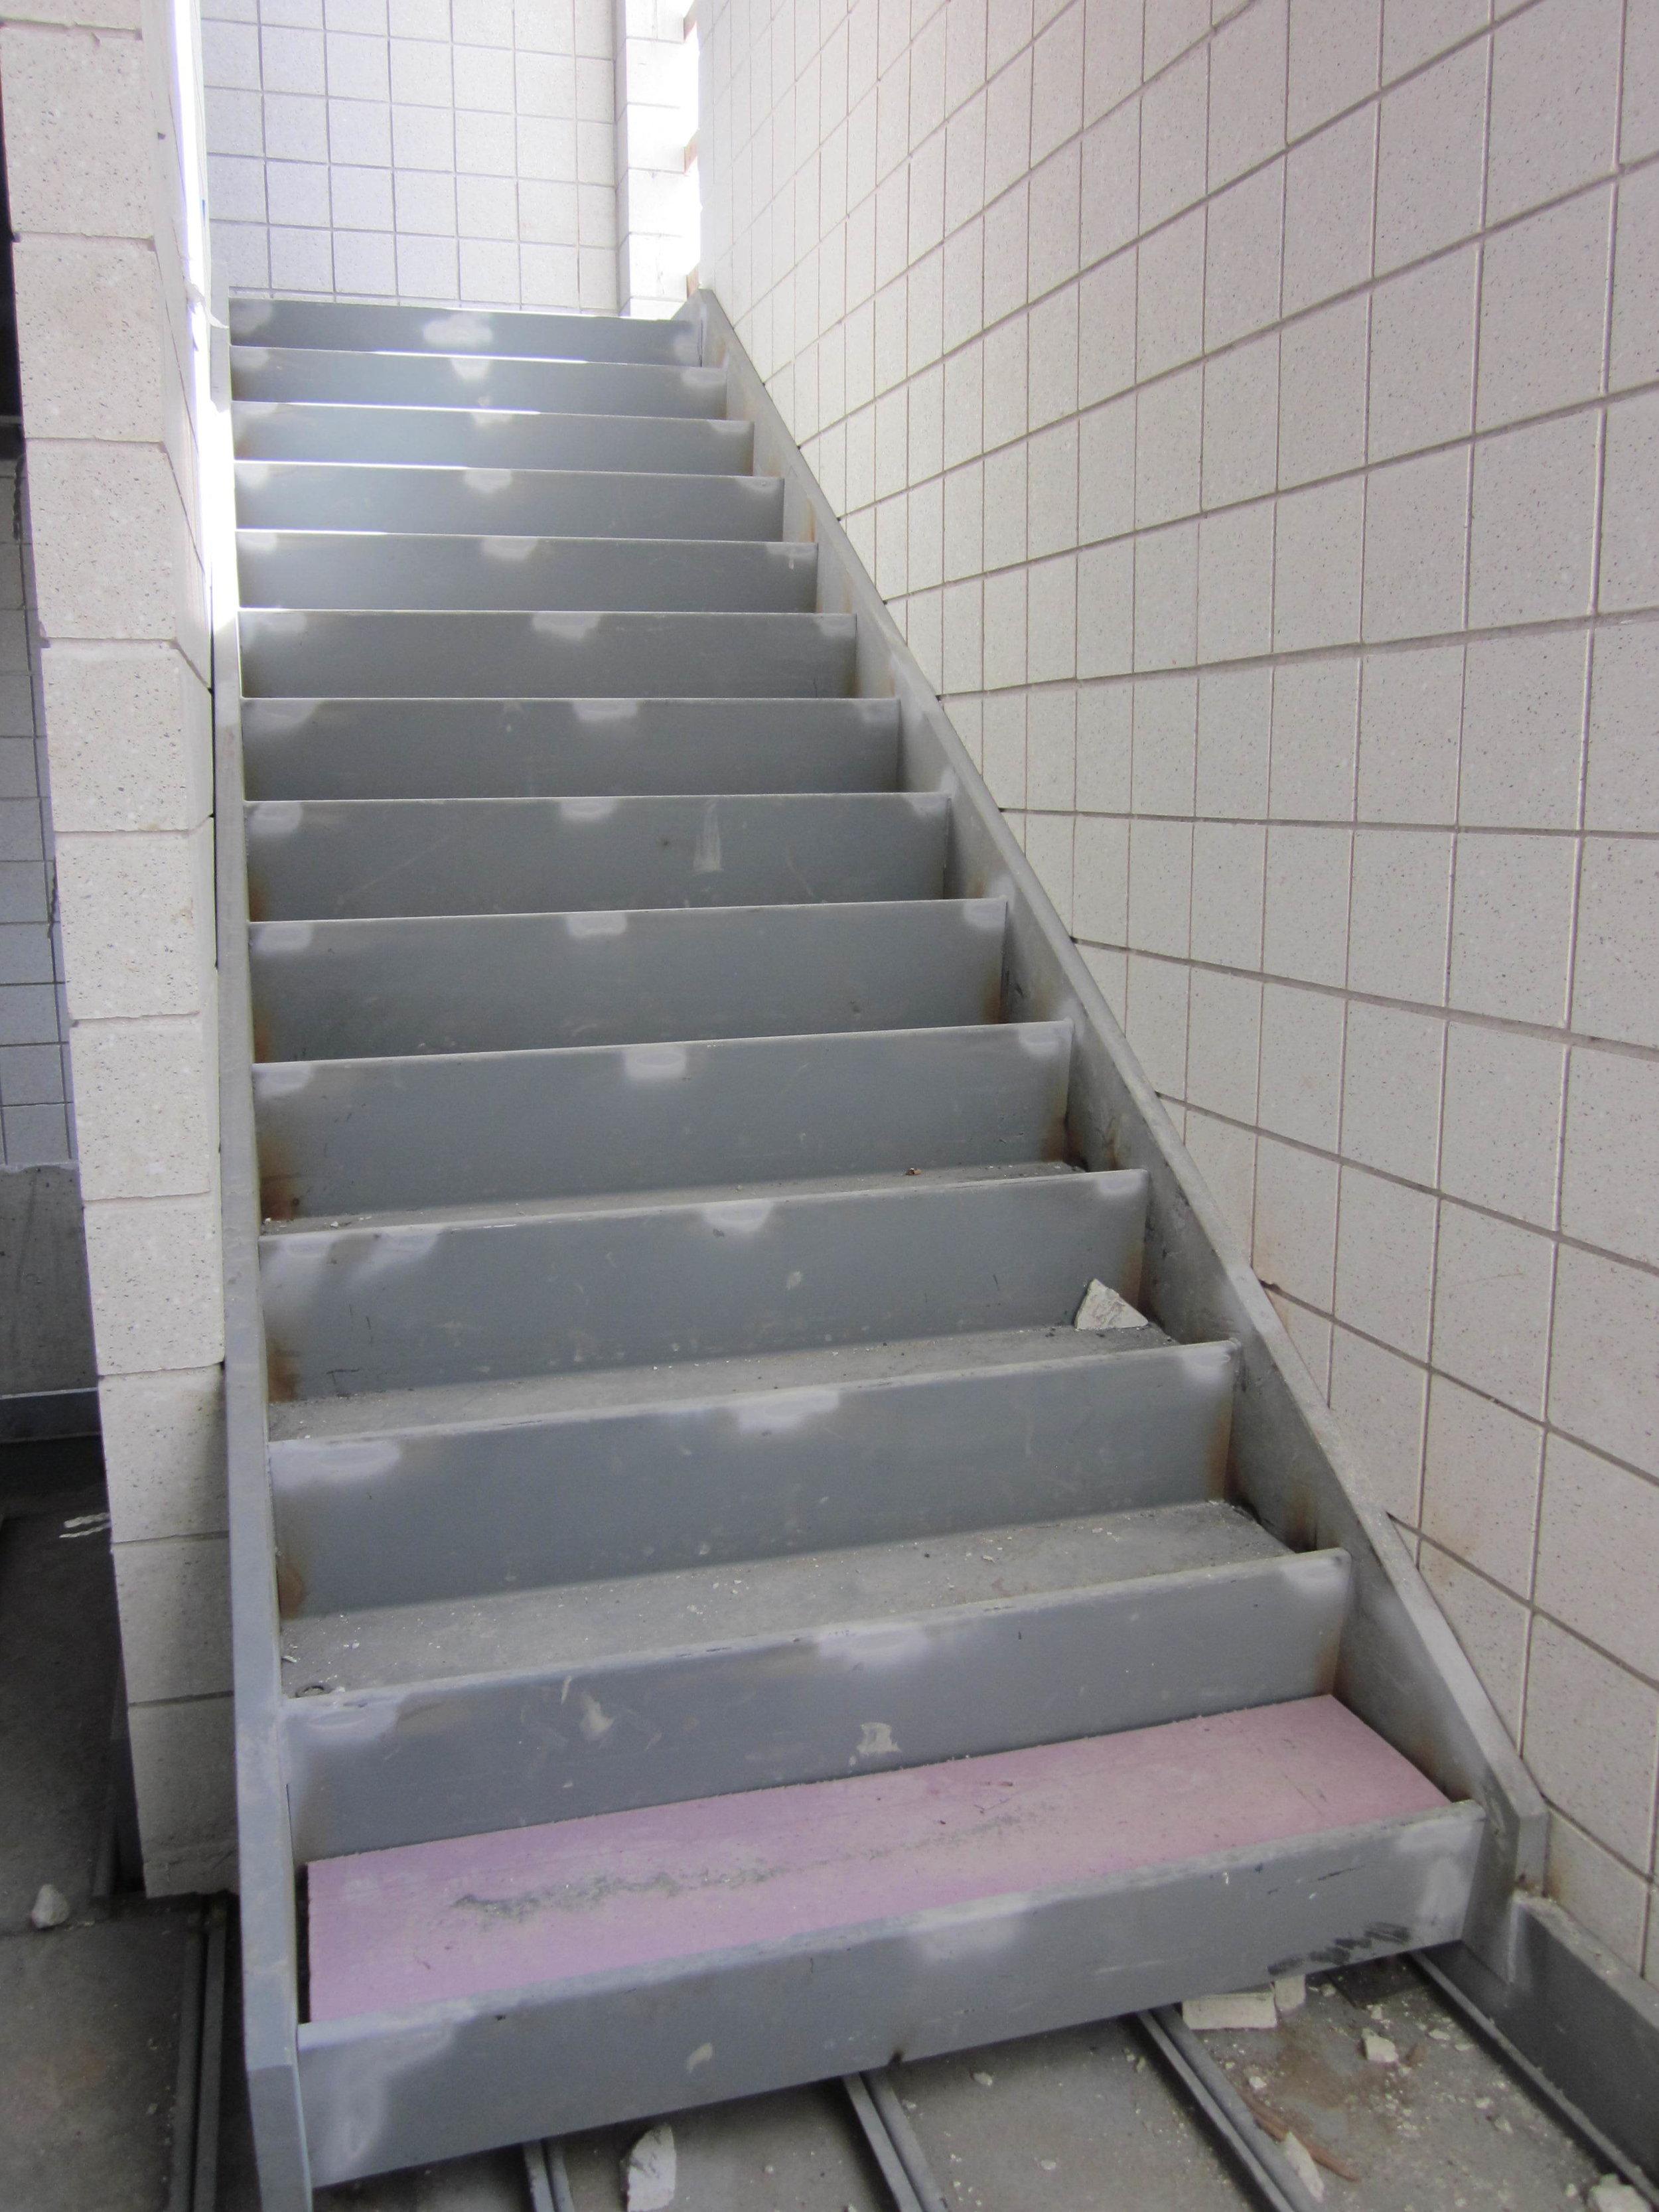 Main to upper floor stairs  05.18.2018.JPG